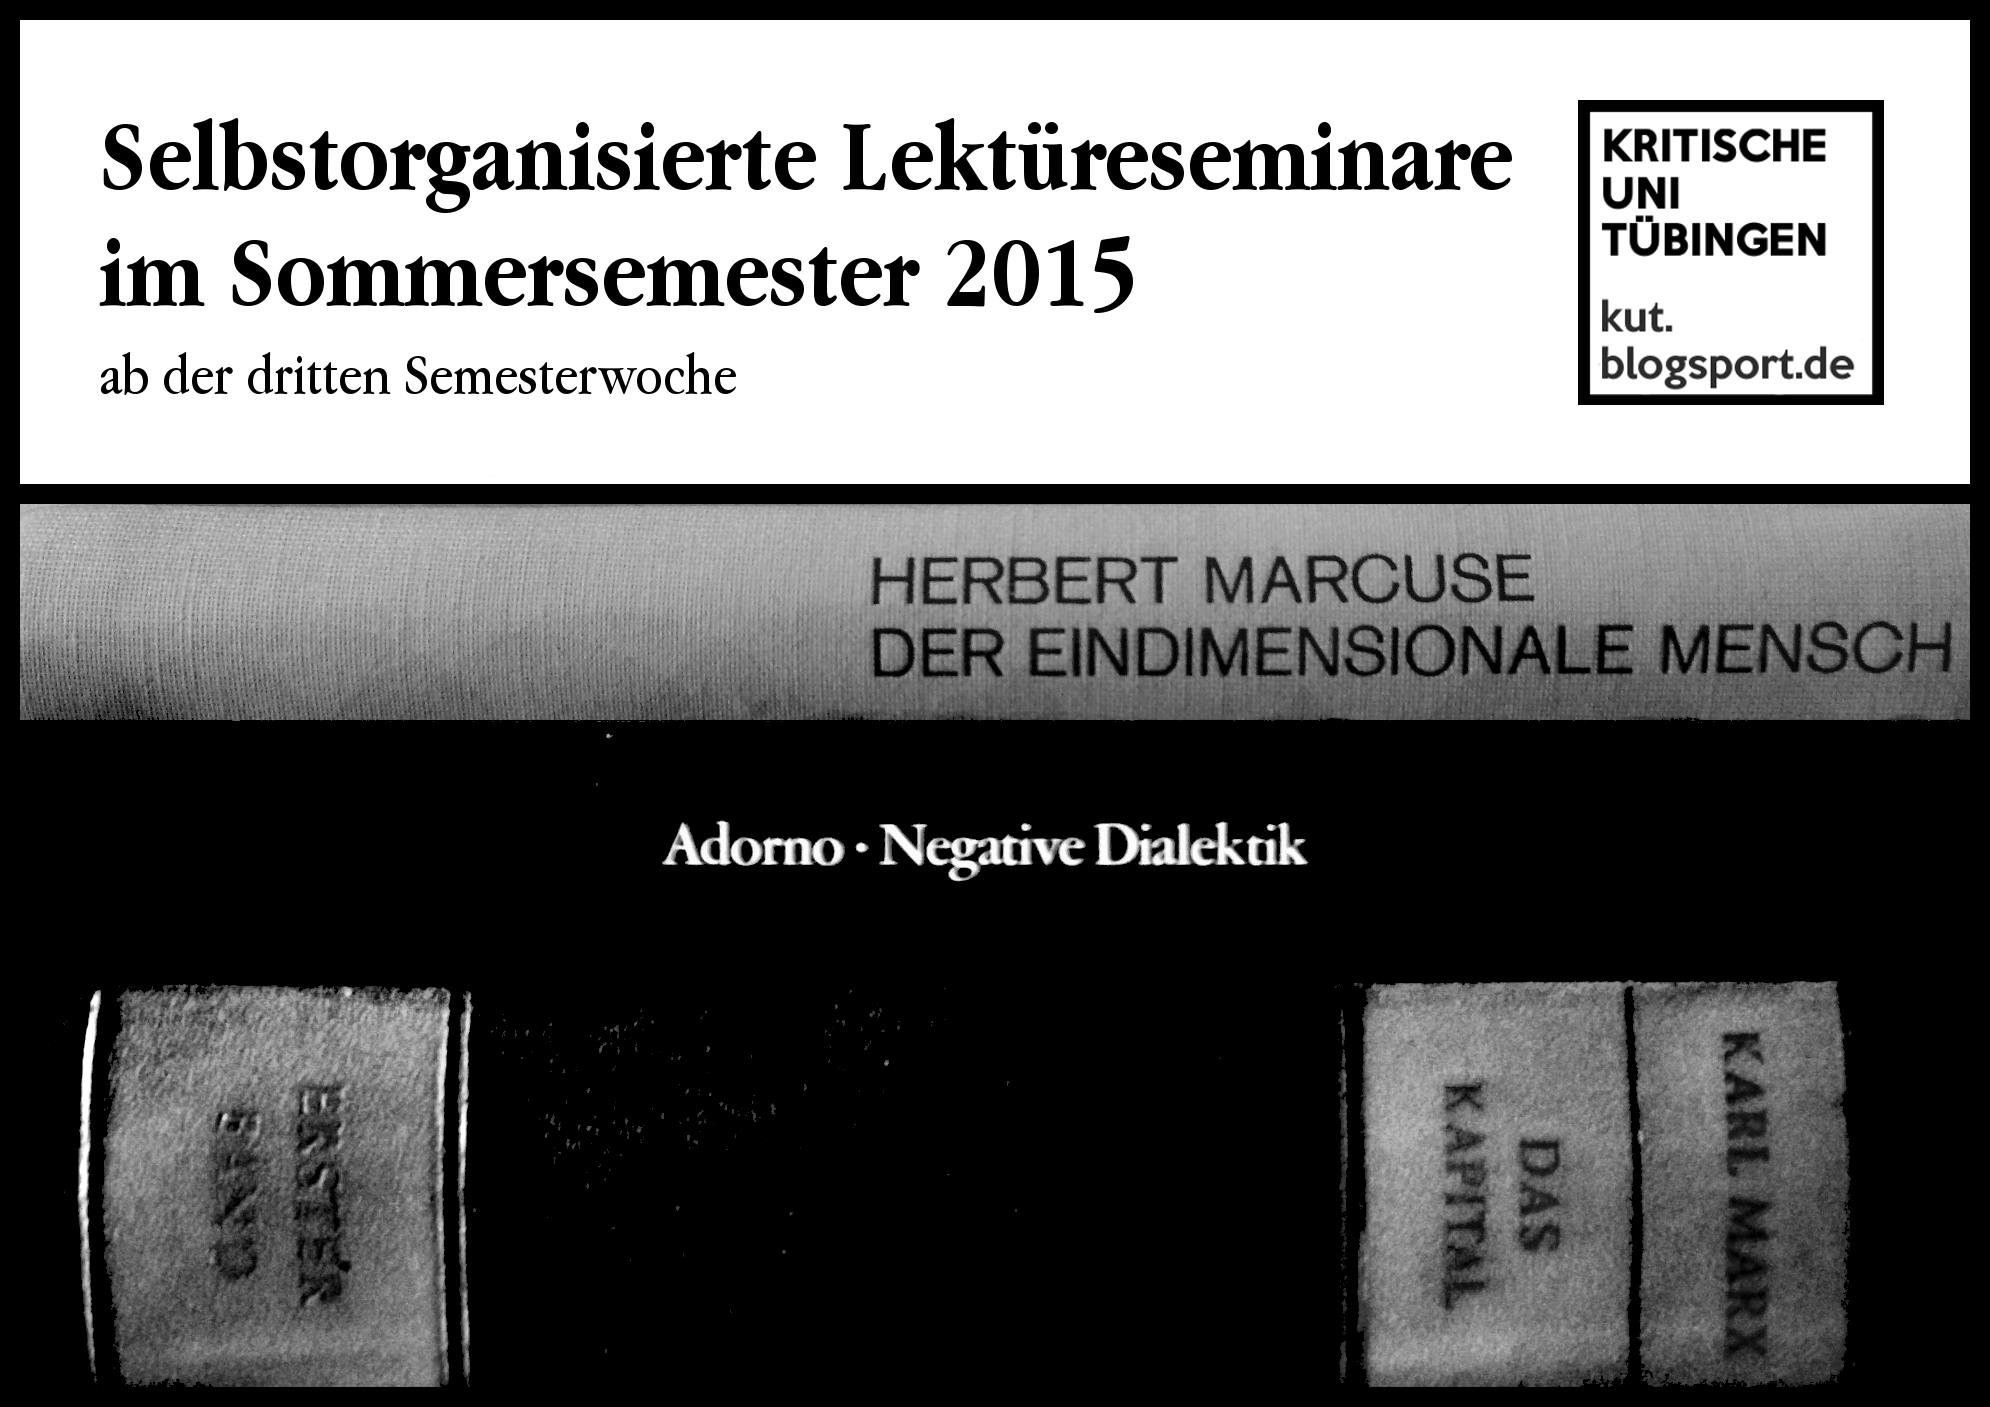 Lektuereseminare Sose 2015